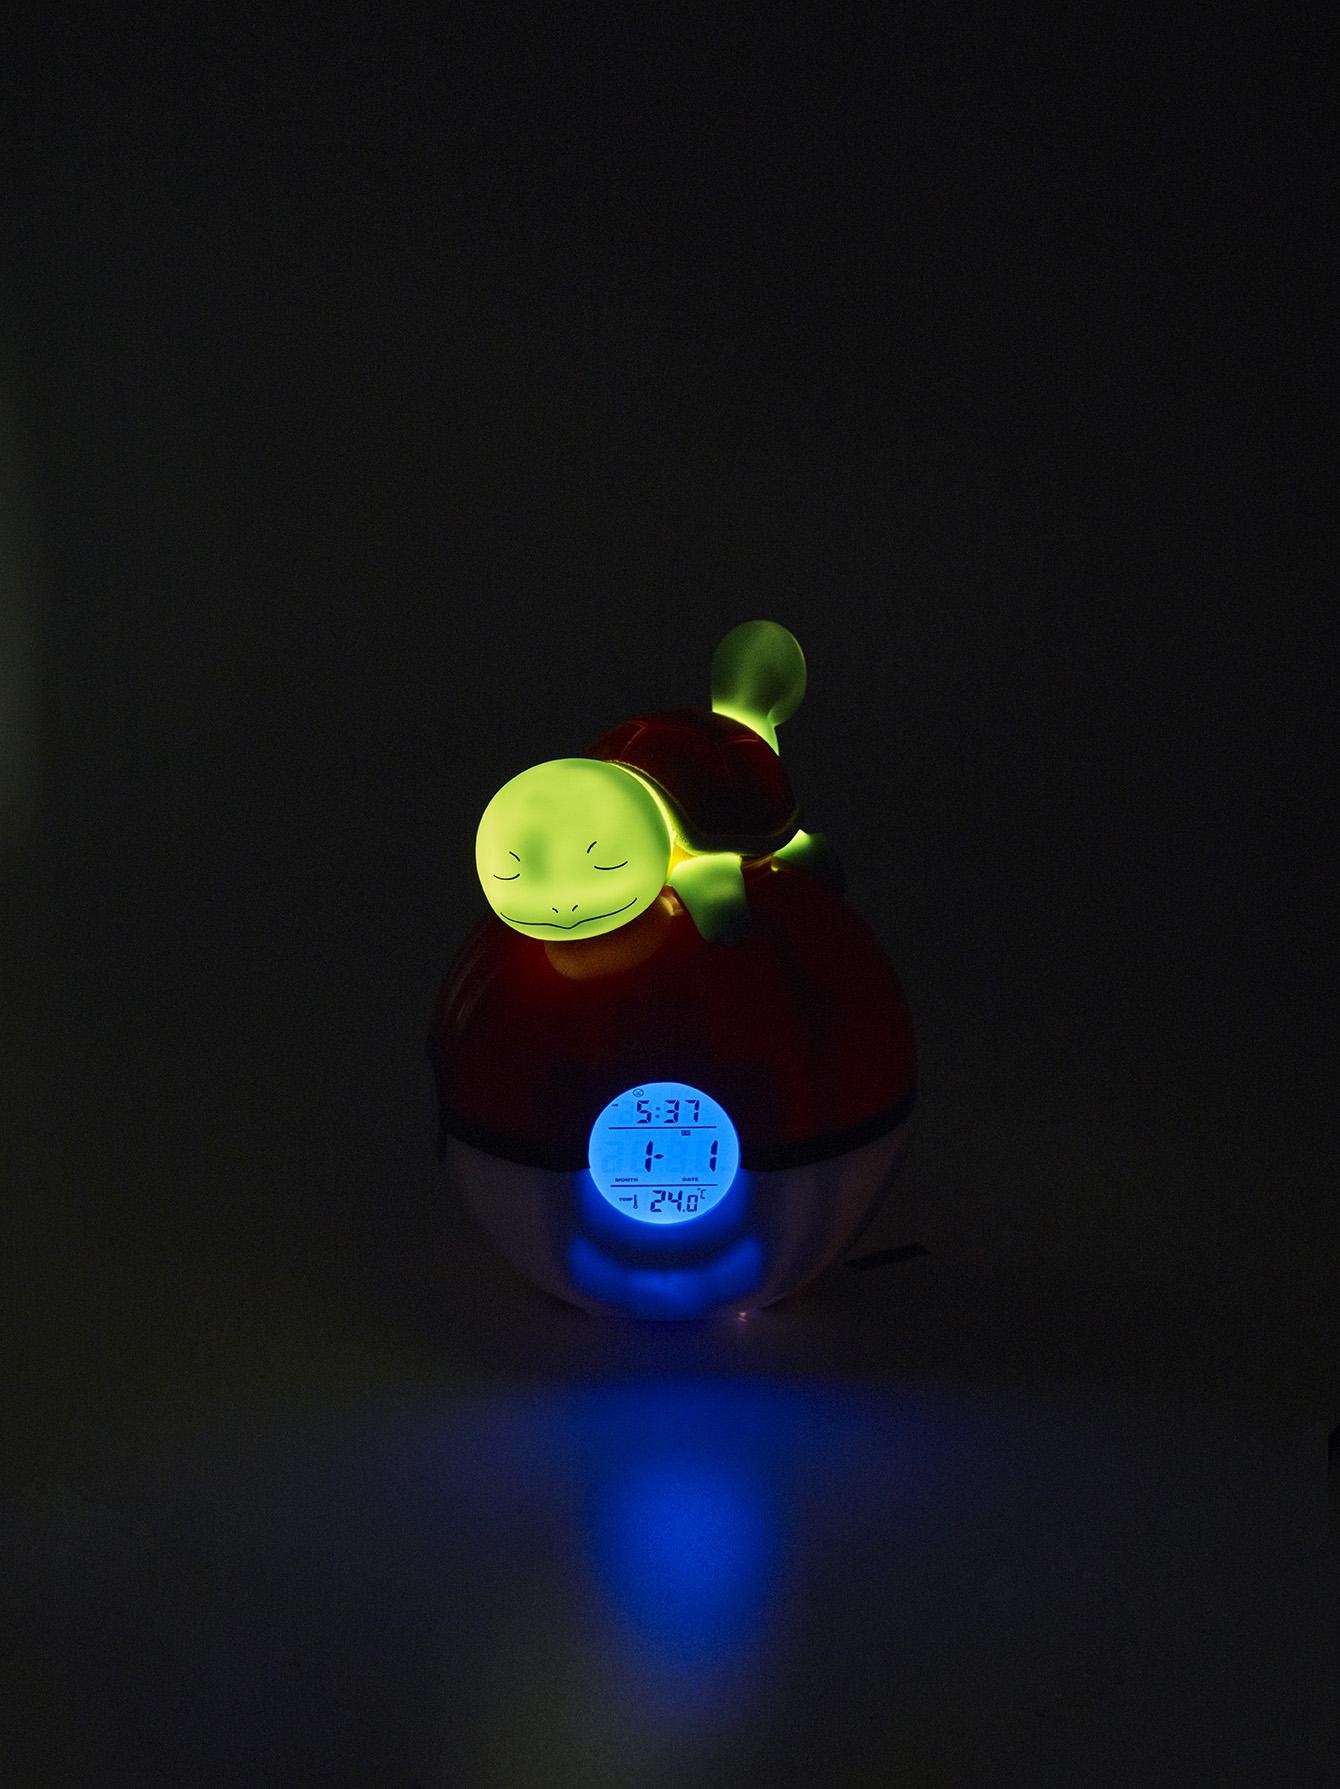 Pokémon Squirtle Night light and Alarm Clock 4